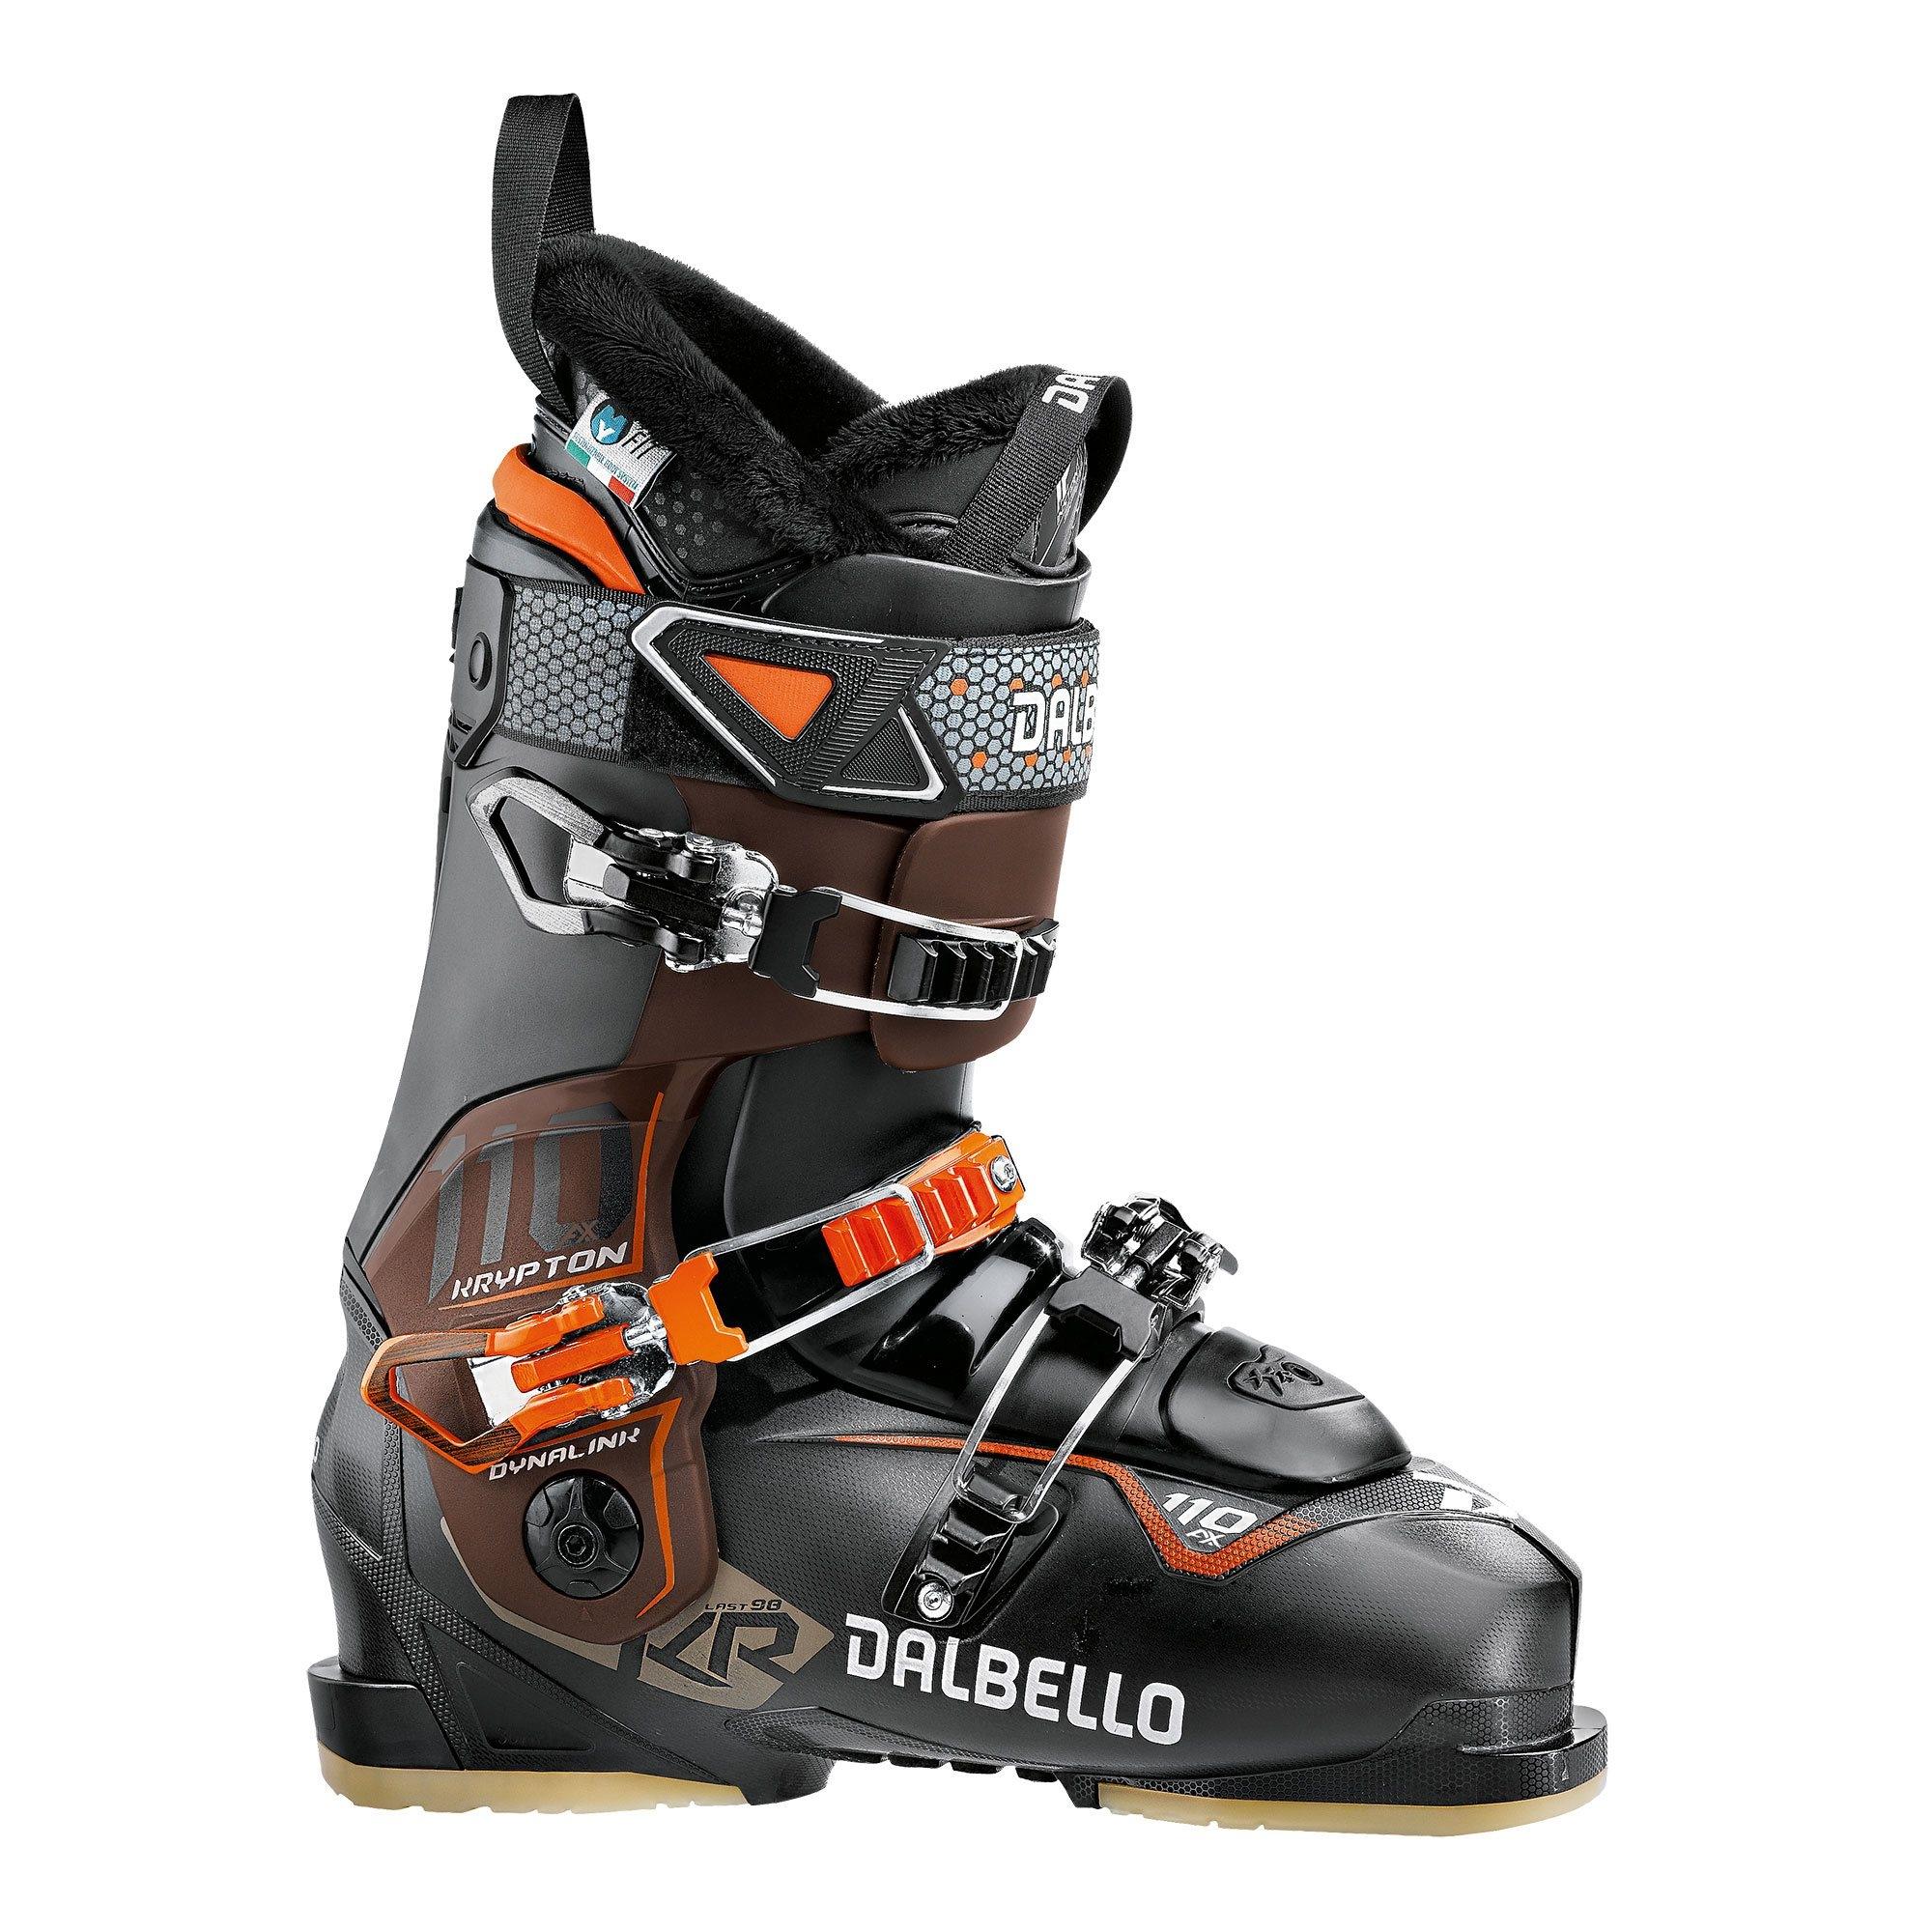 Dalbello Krypton AX 110 Ski Boot Black Bronze/Black 2018